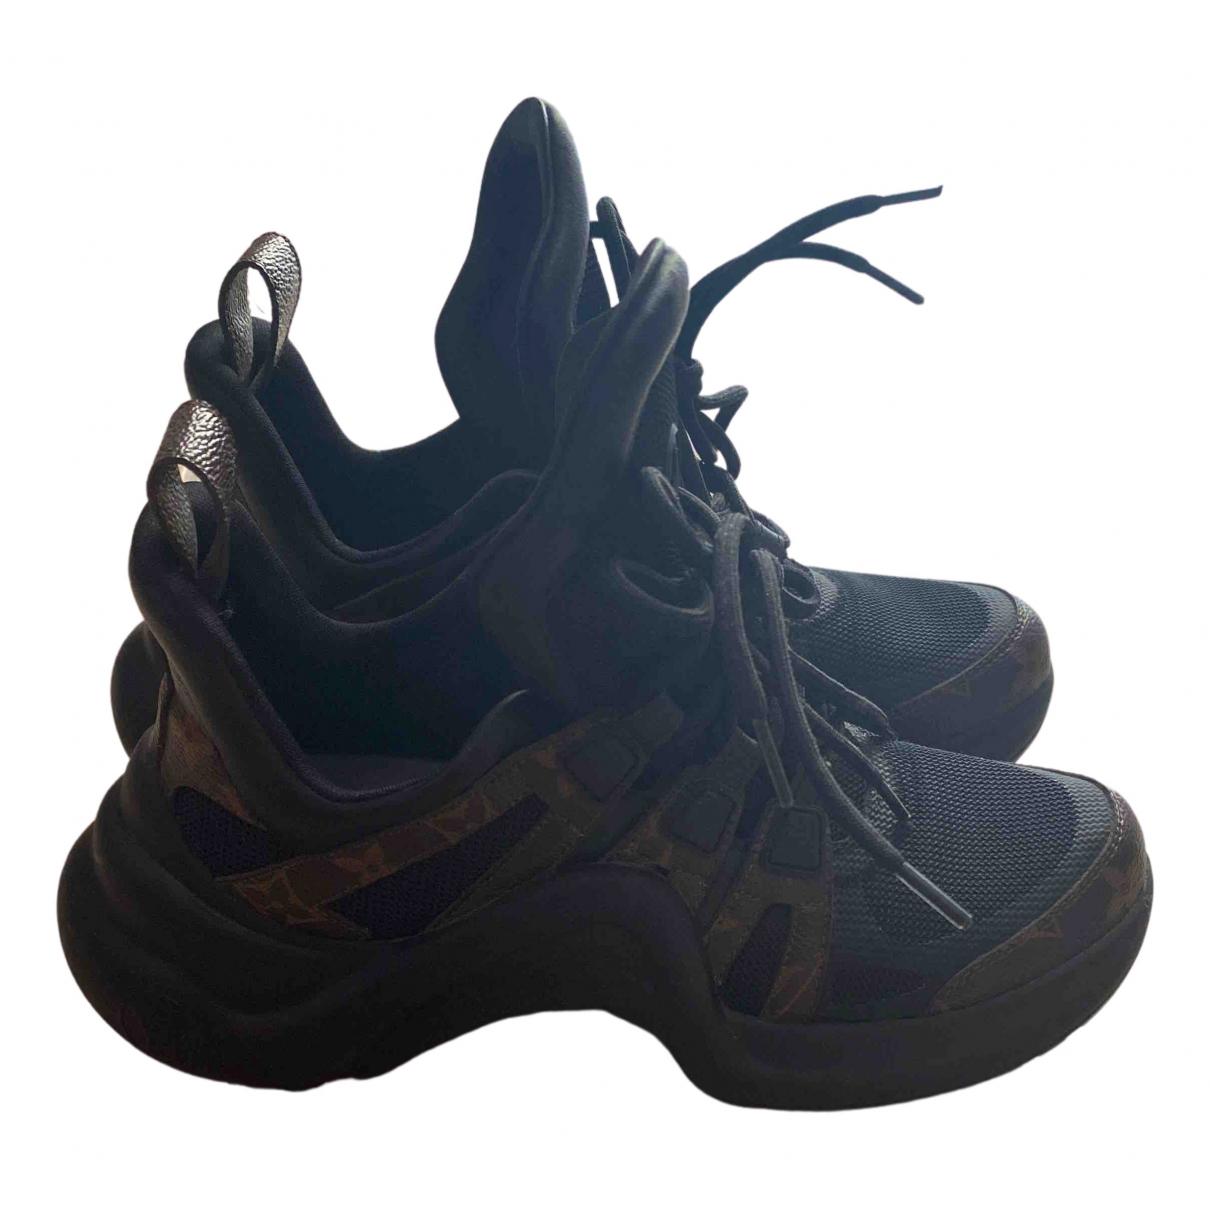 Louis Vuitton Archlight Sneakers in  Schwarz Leder